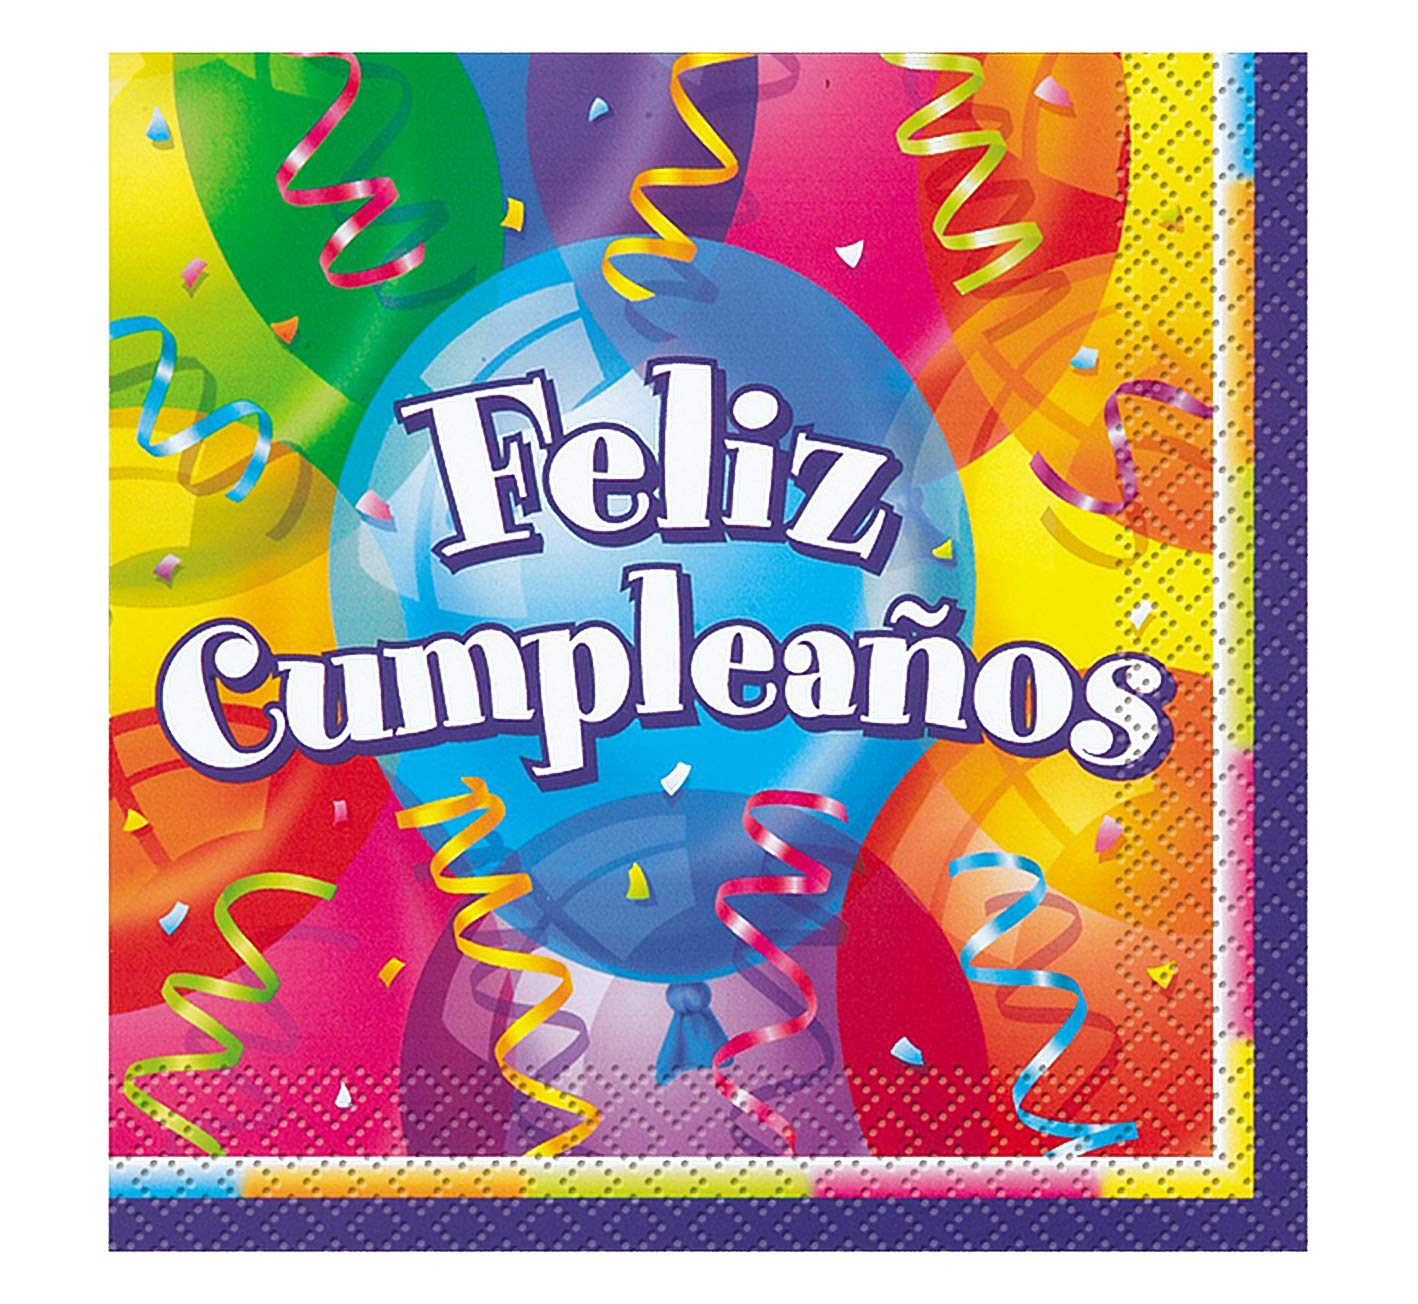 Amazon.com: Feliz Cumpleanos Goodie Bags, 8ct: Kitchen & Dining